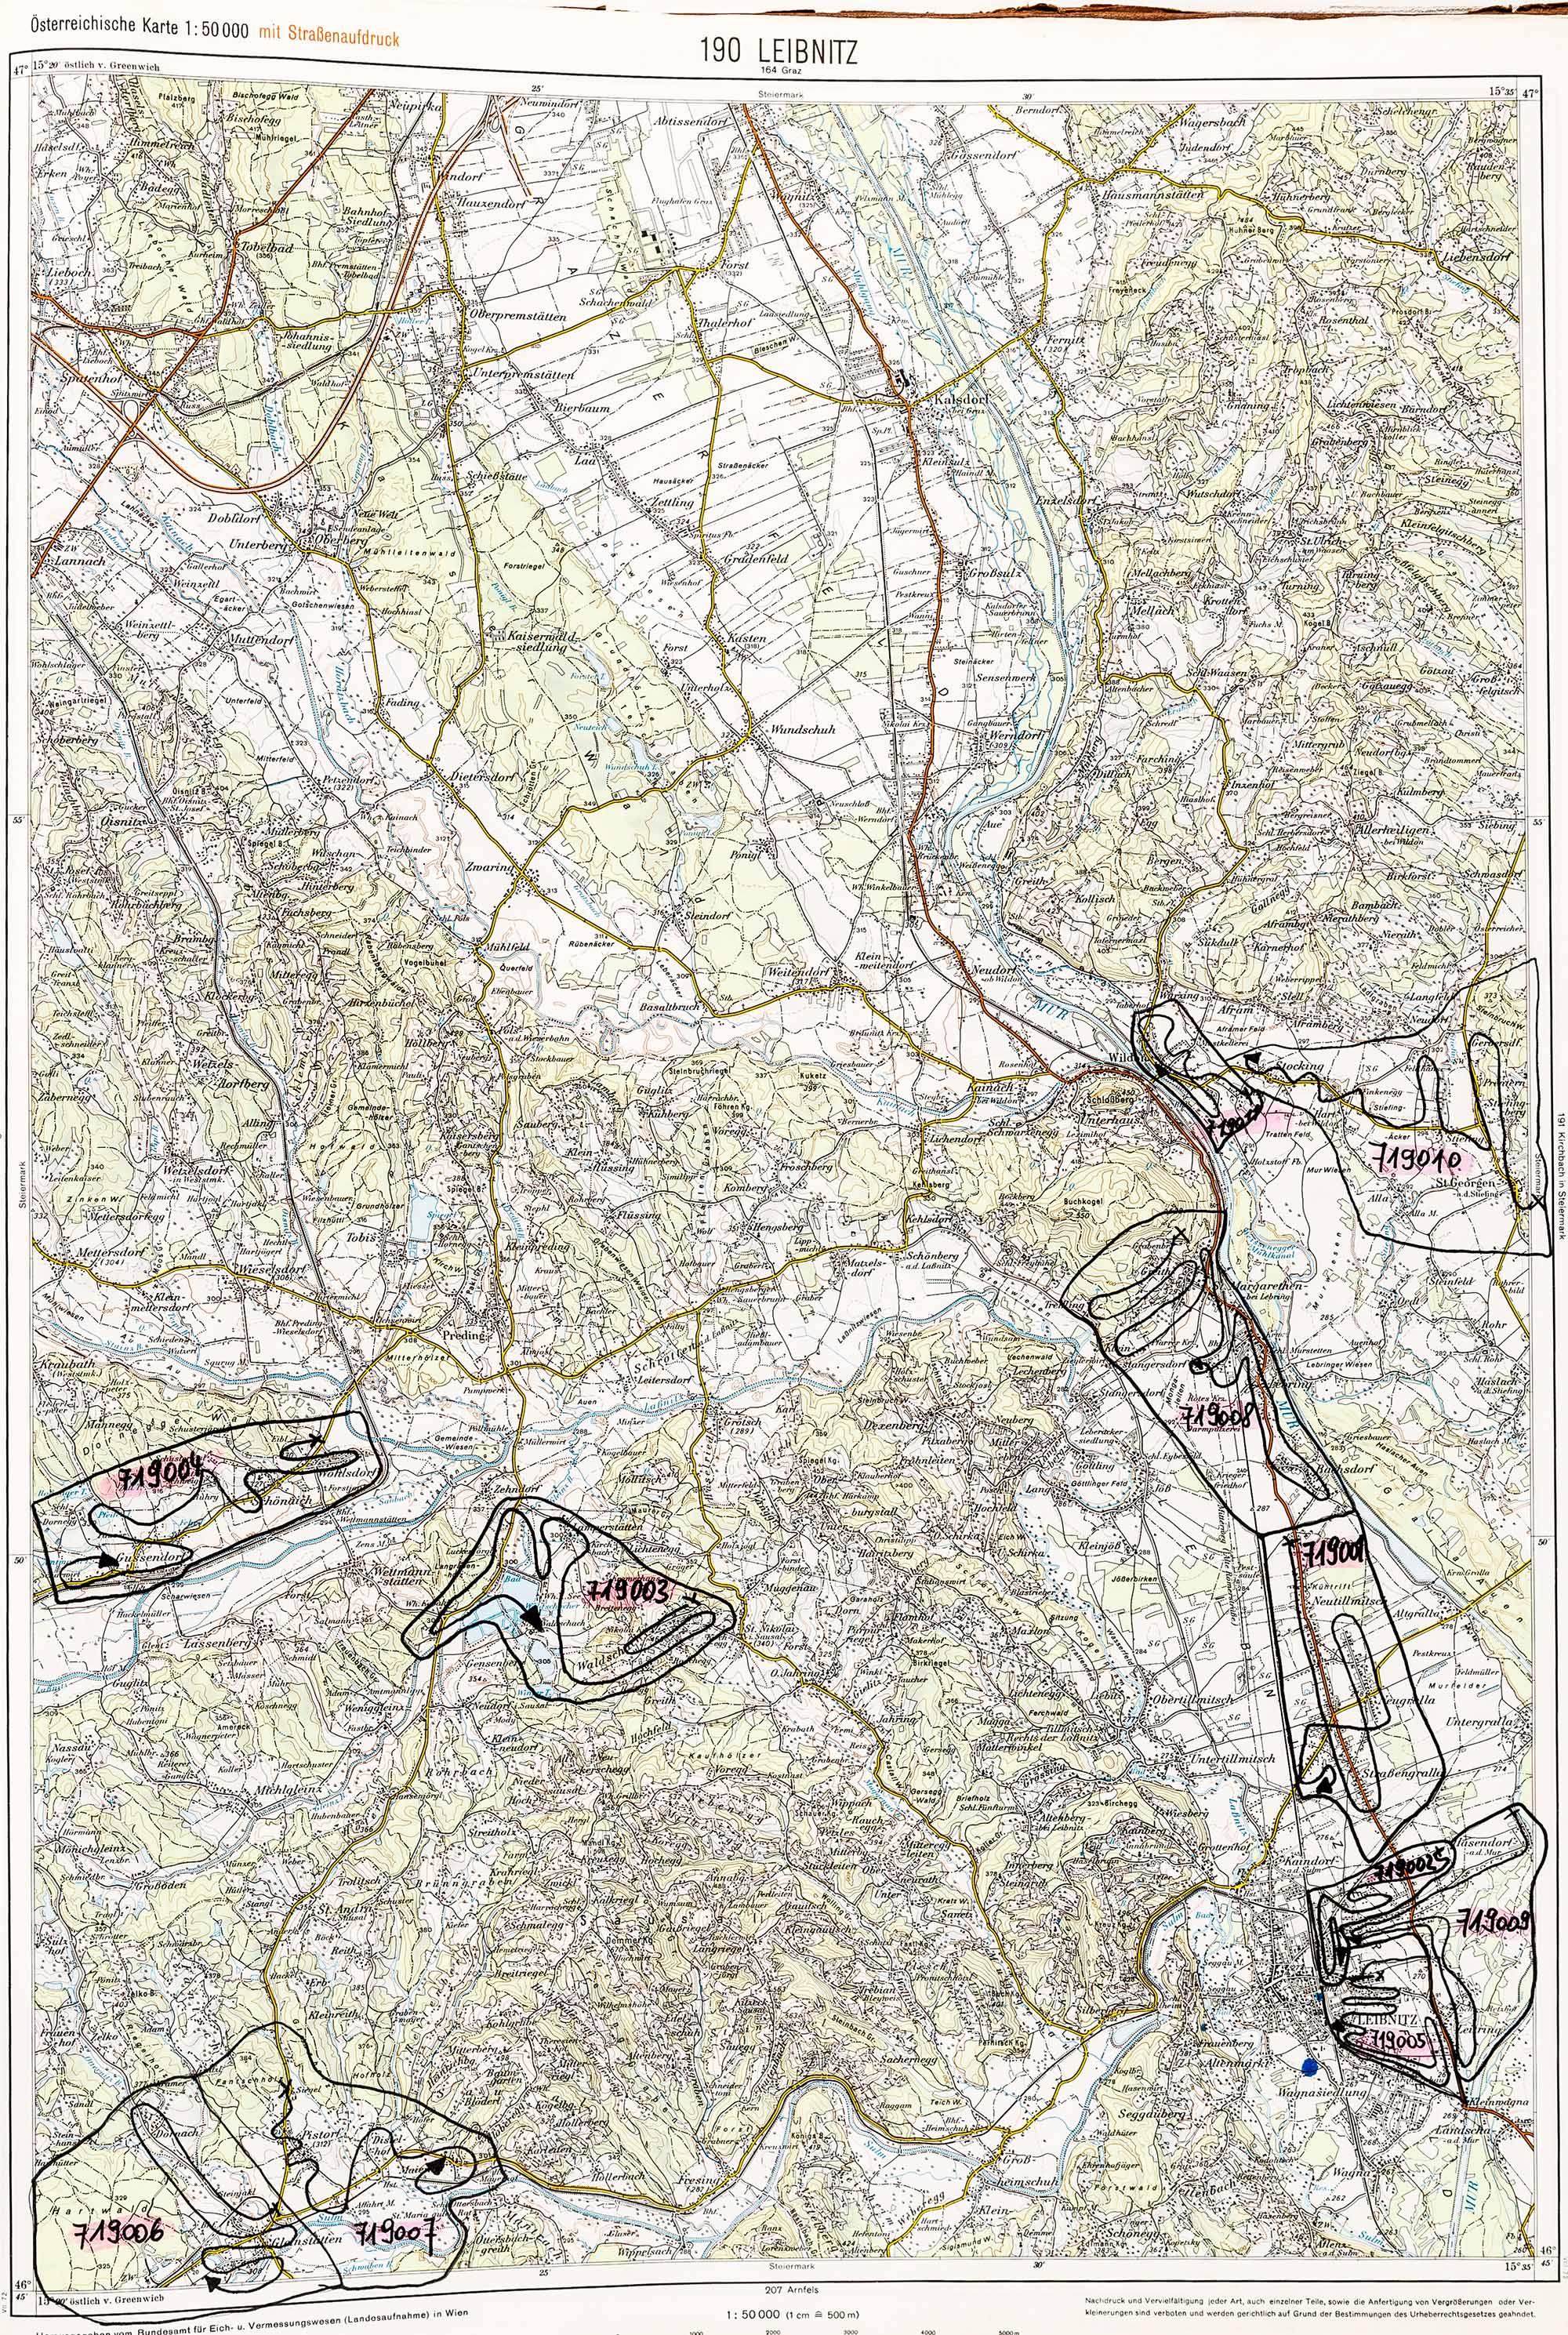 1975-1979 Karte 190